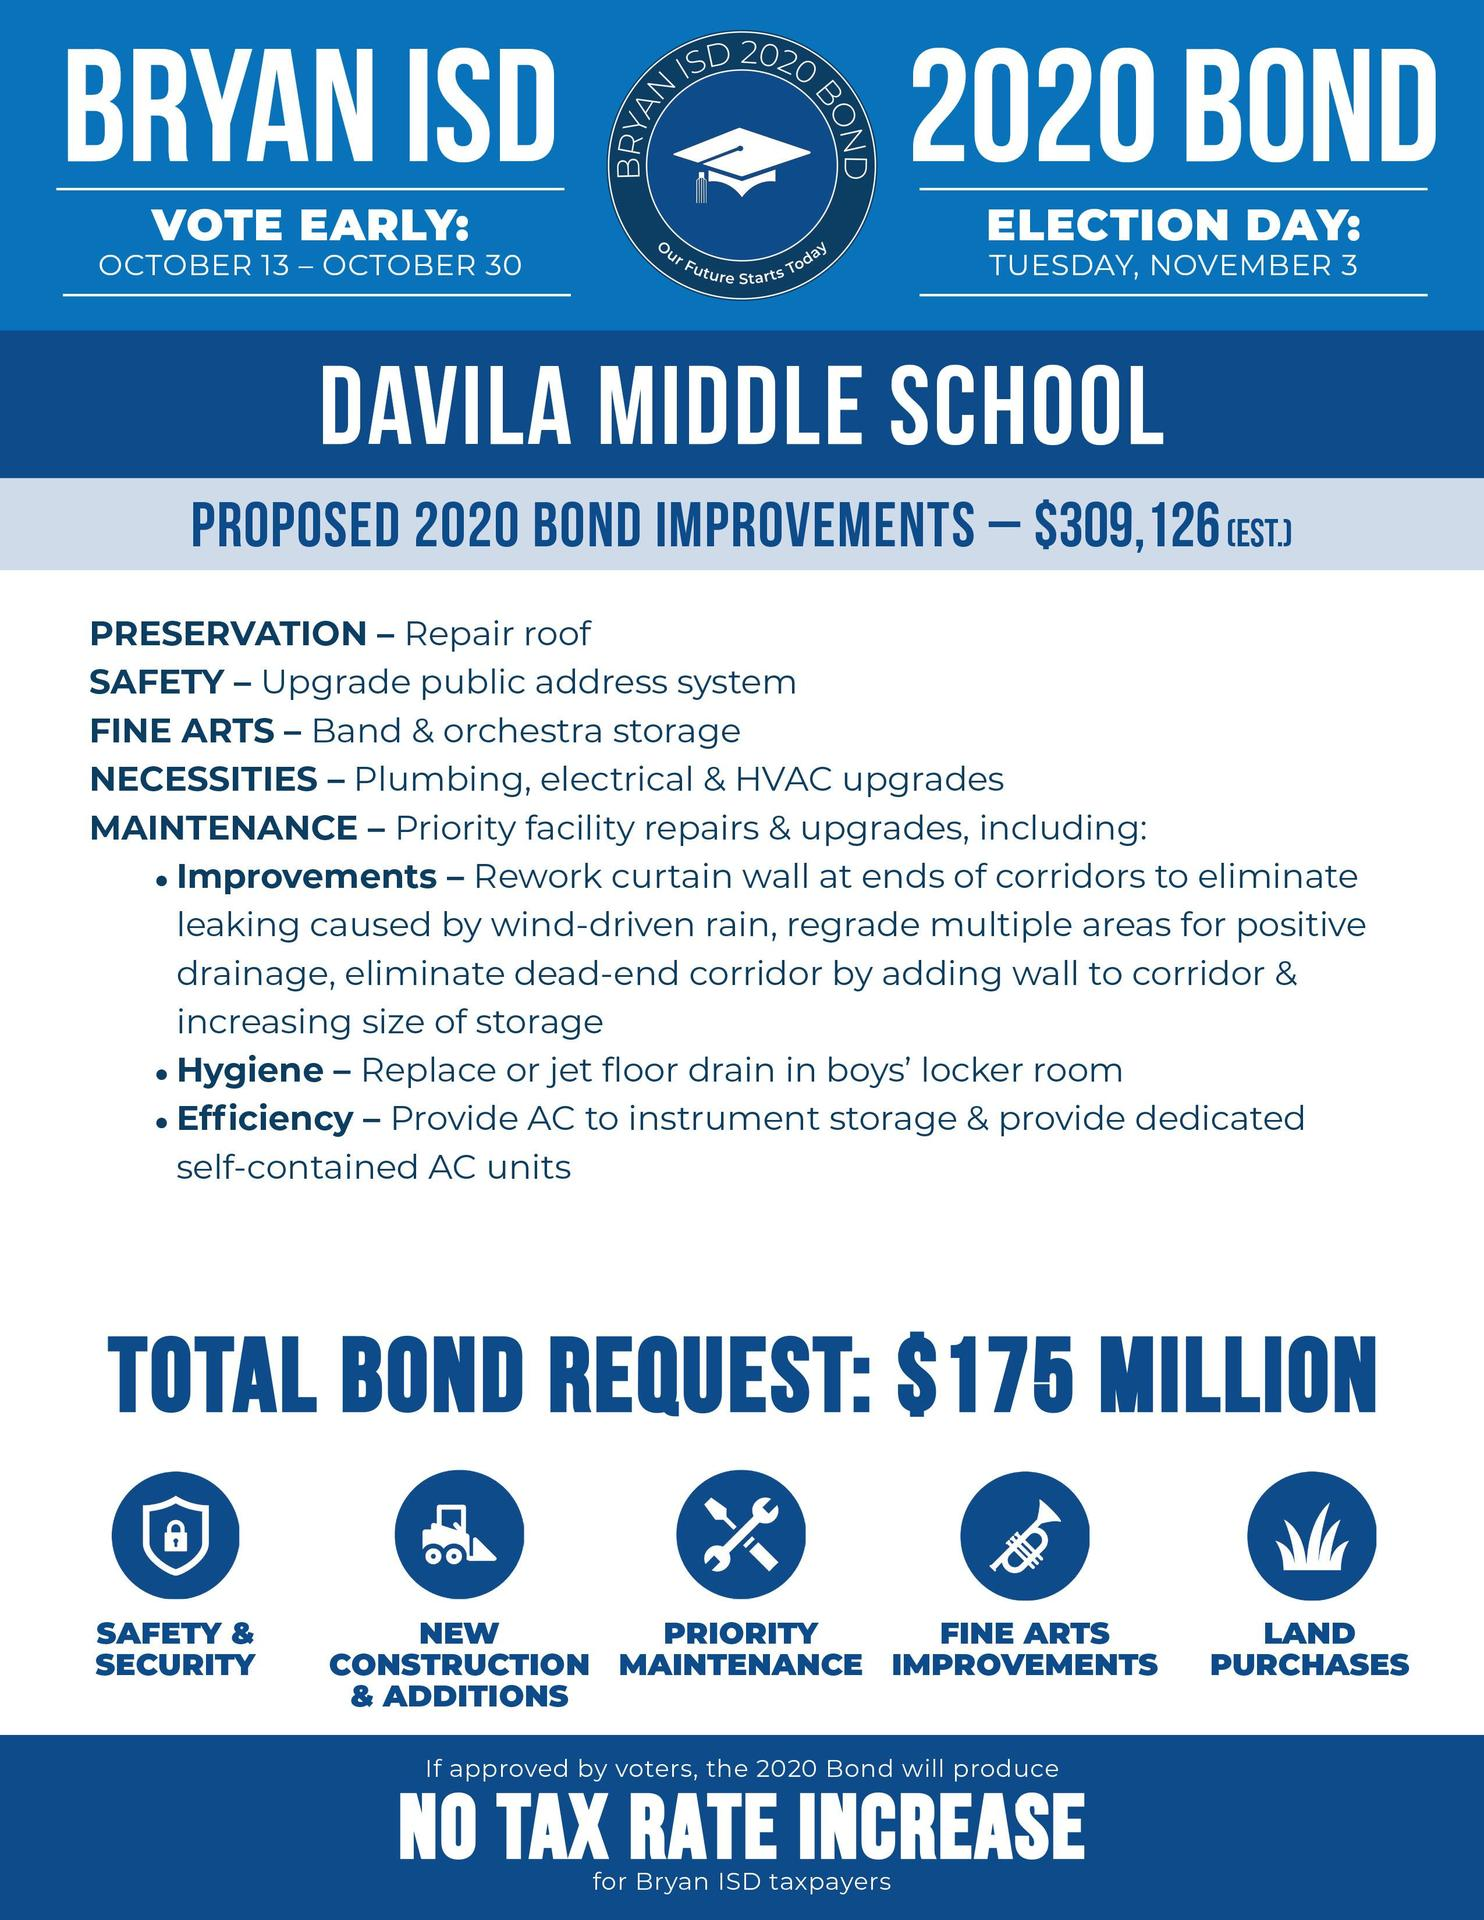 Davila Middle School